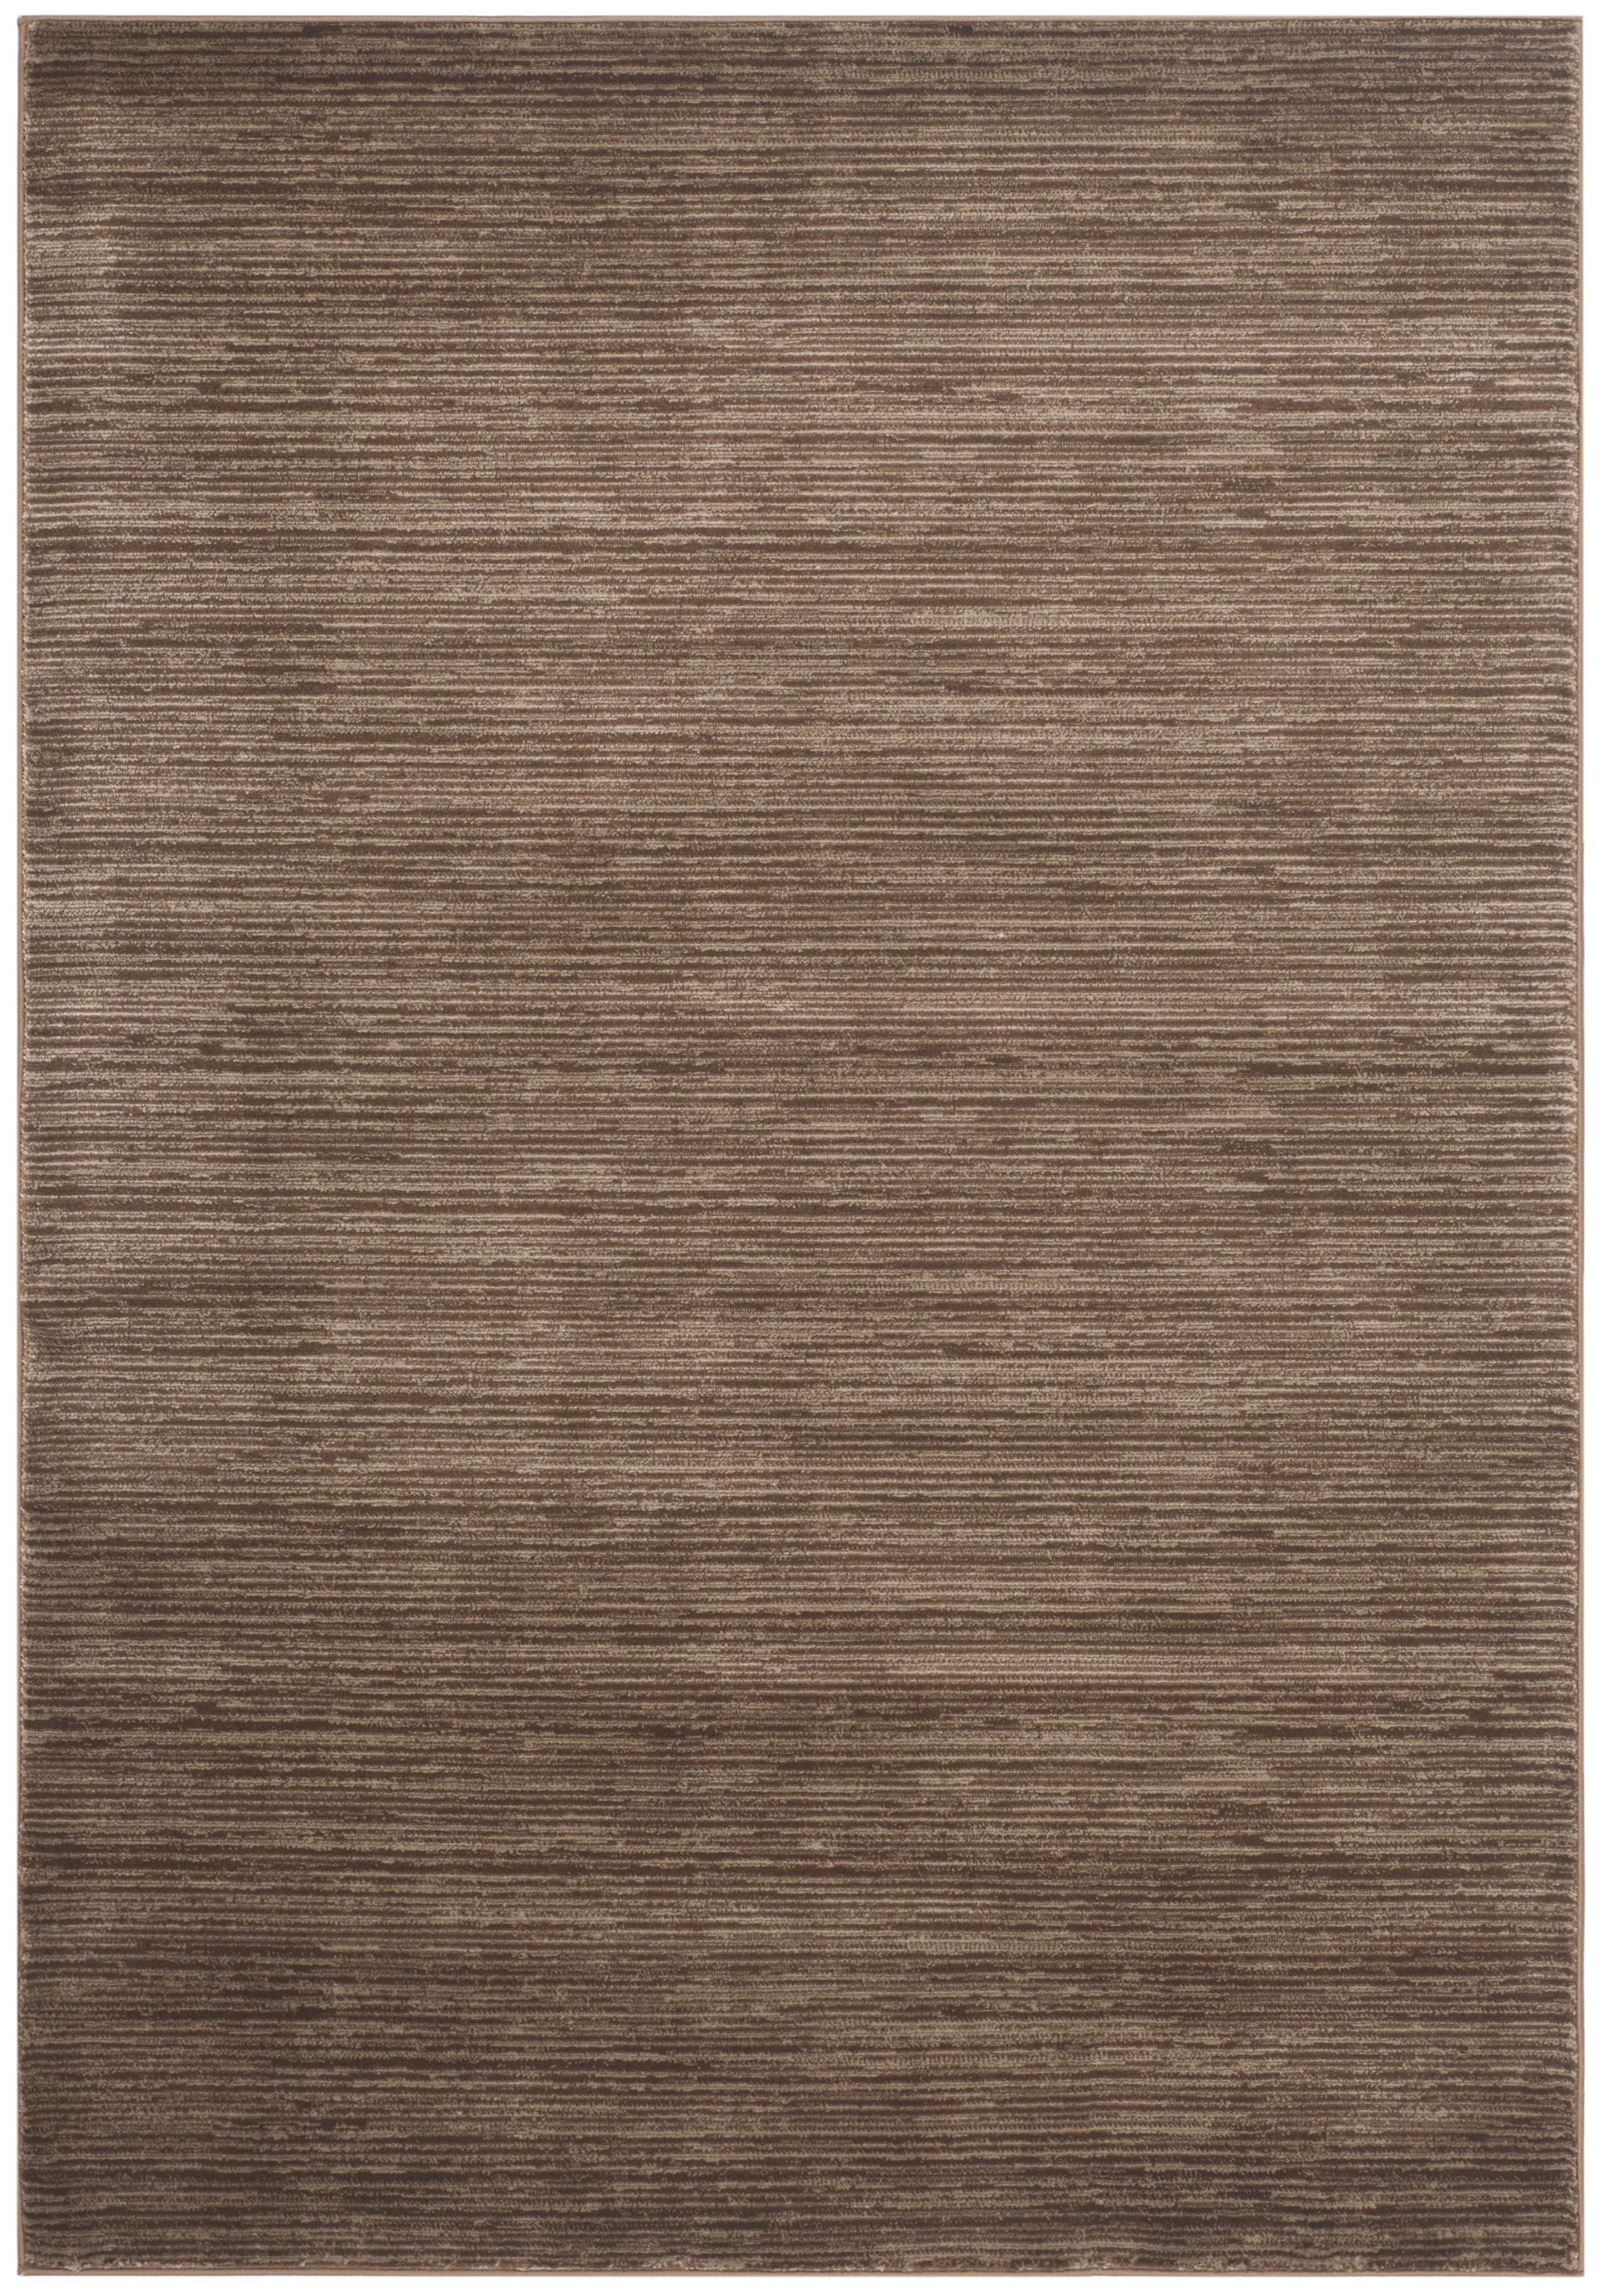 Tapis de salon contemporain marron 120x180